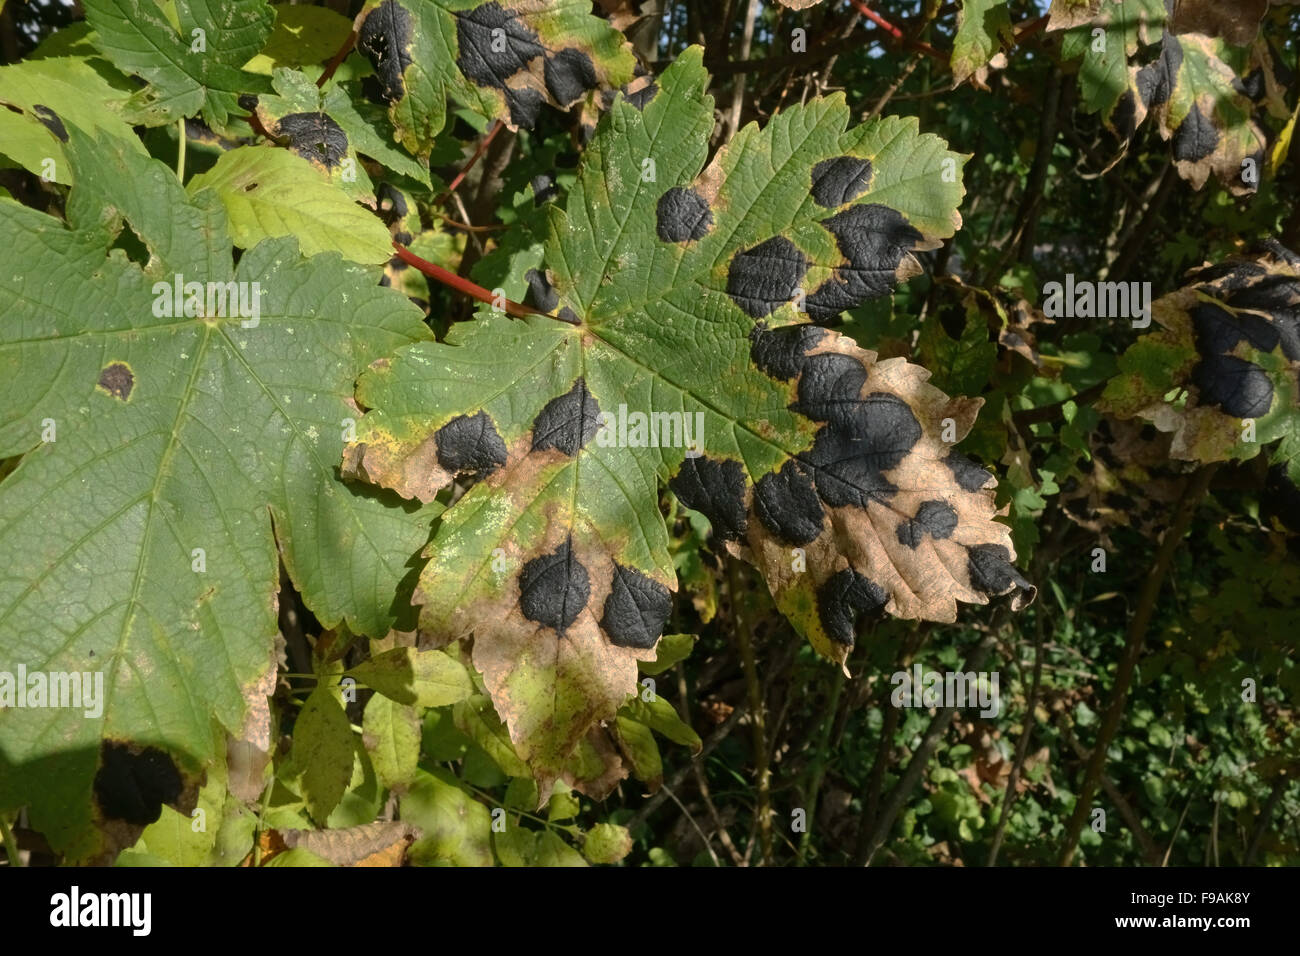 Tar spot, Rhytisma acxerinum, bold black disease spots and necrosis on a sycamore leaf, Berkshire - Stock Image